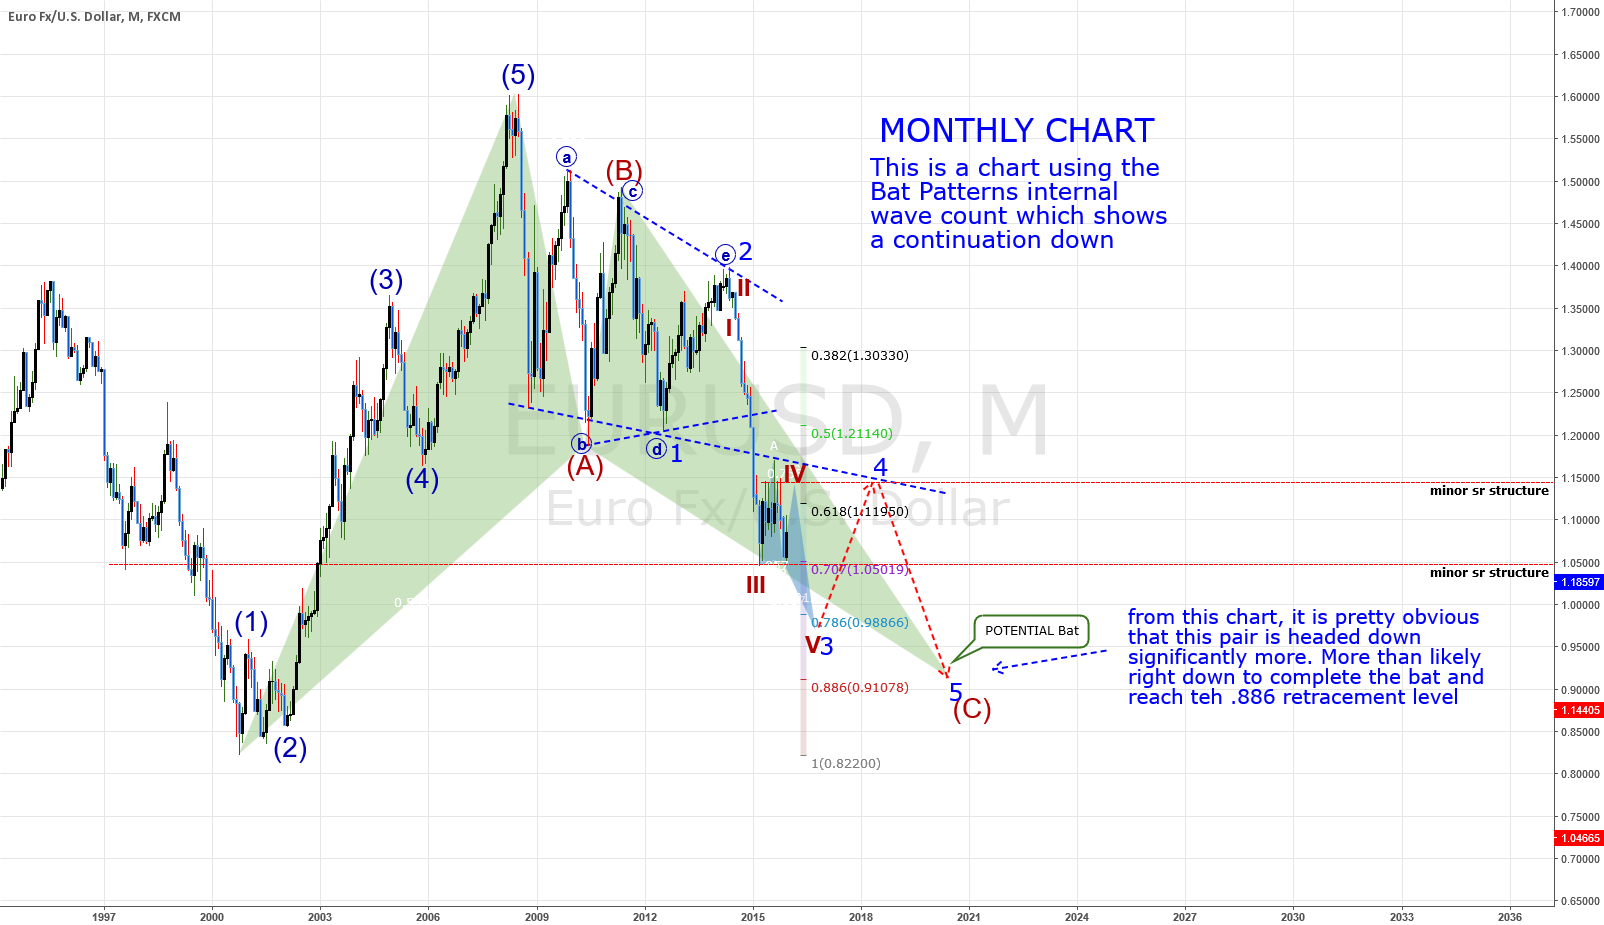 MONTHLY Chart: EURUSD: Bat Pattern Internal Wave Count